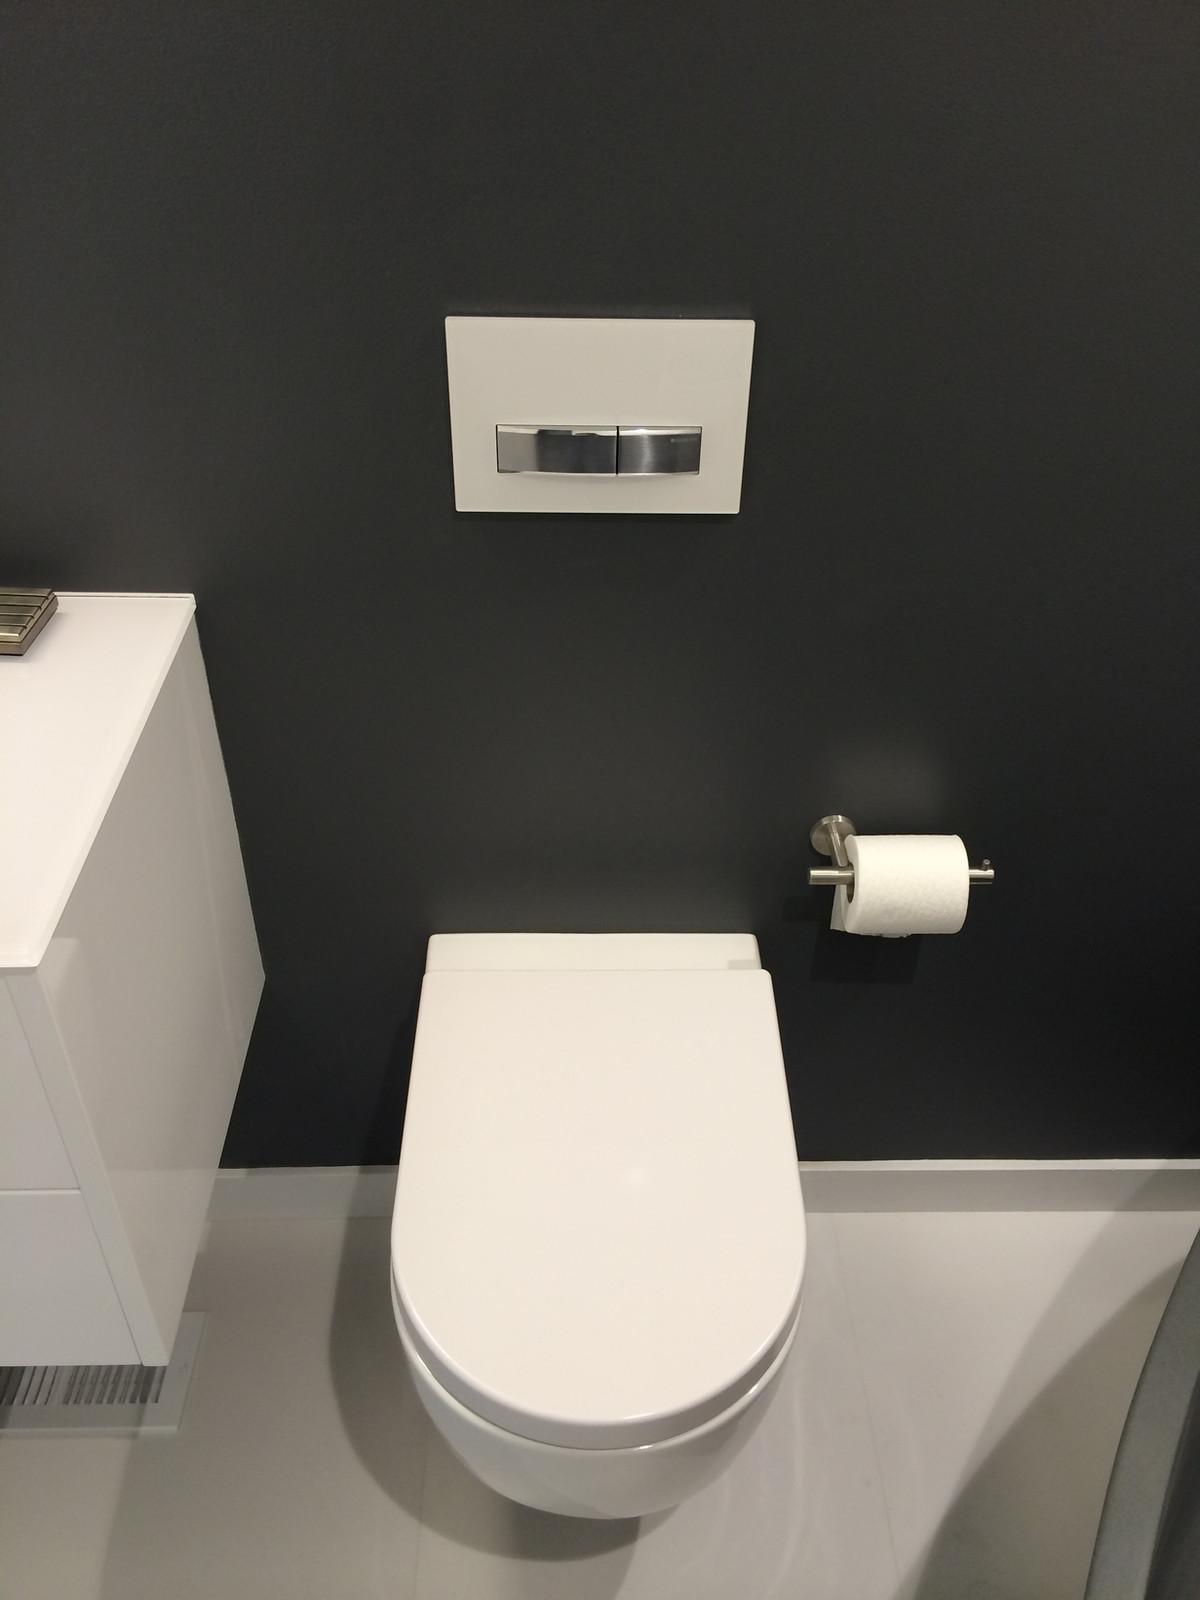 Atherton Bathroom Remodel Innovo 03